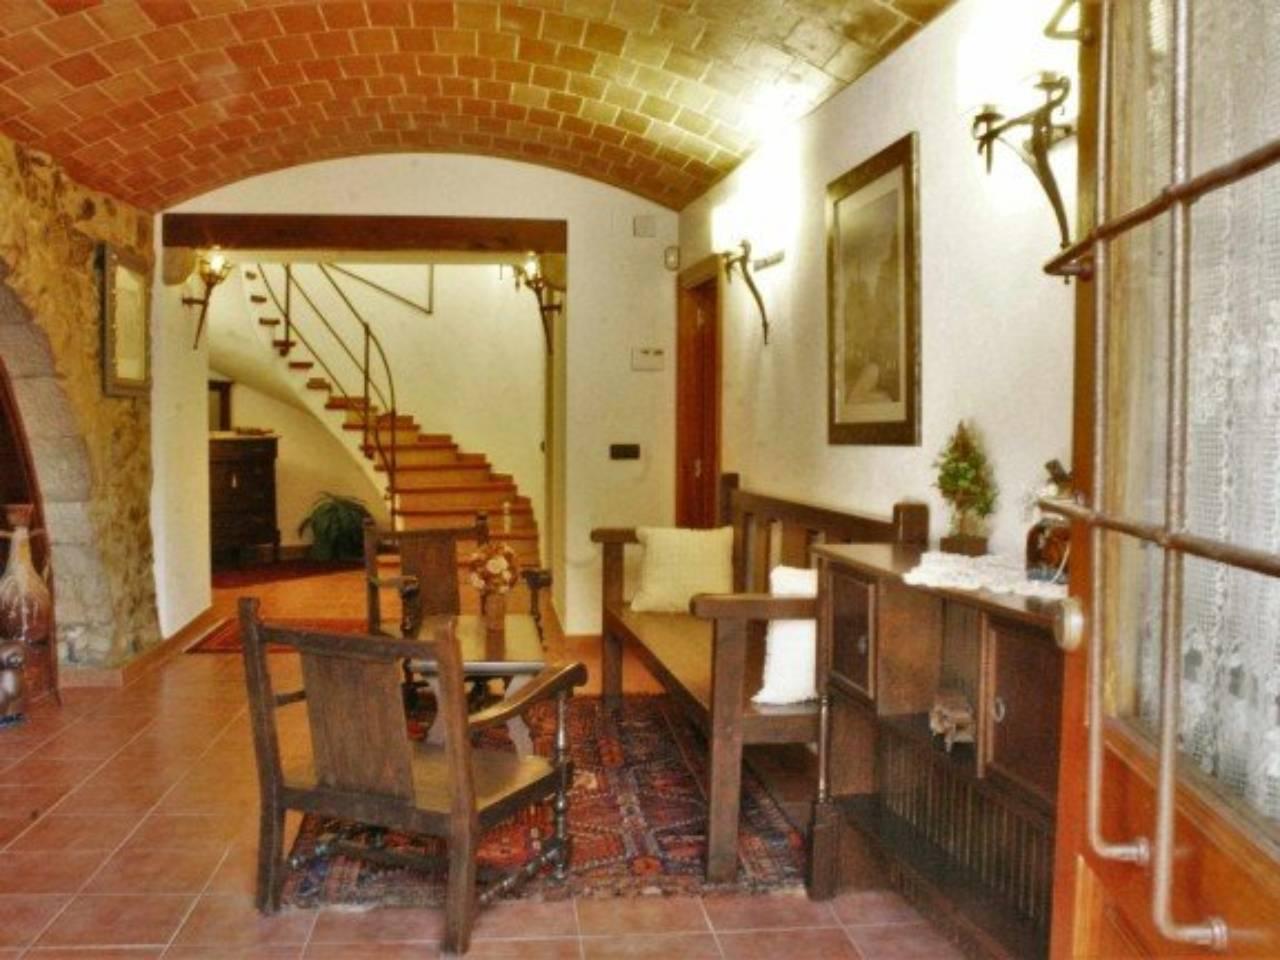 Casa  Calle de baix. Superf. 590 m²,  5 habitaciones ( 2 suits,  3 dobles),  3 baños,